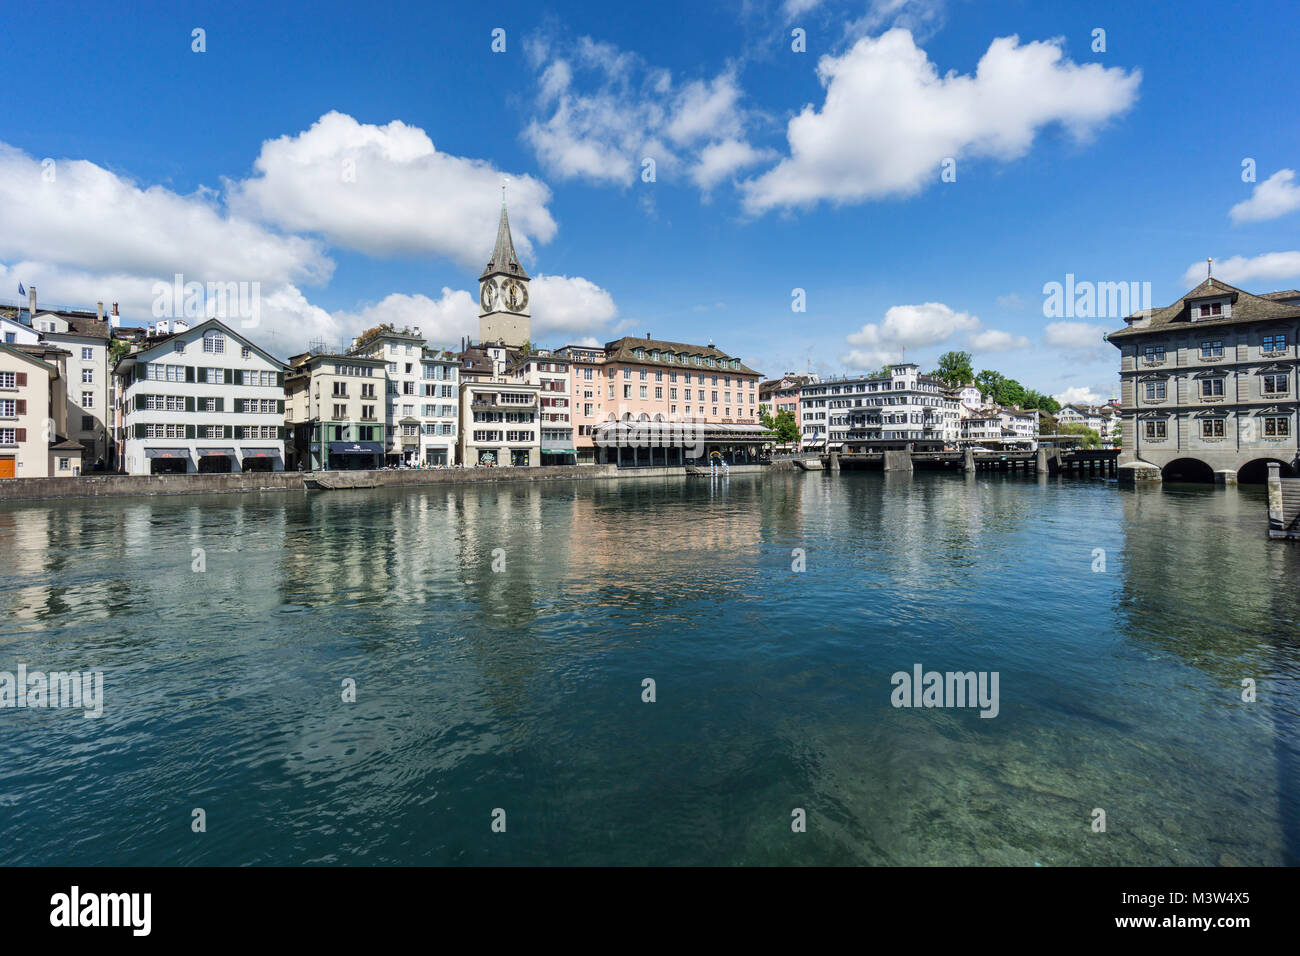 Limmat, St. Peterskirche, Zürich, Schweiz   Limmat, St. Peters Kirche, Stadt Zürich, Schweiz Stockbild